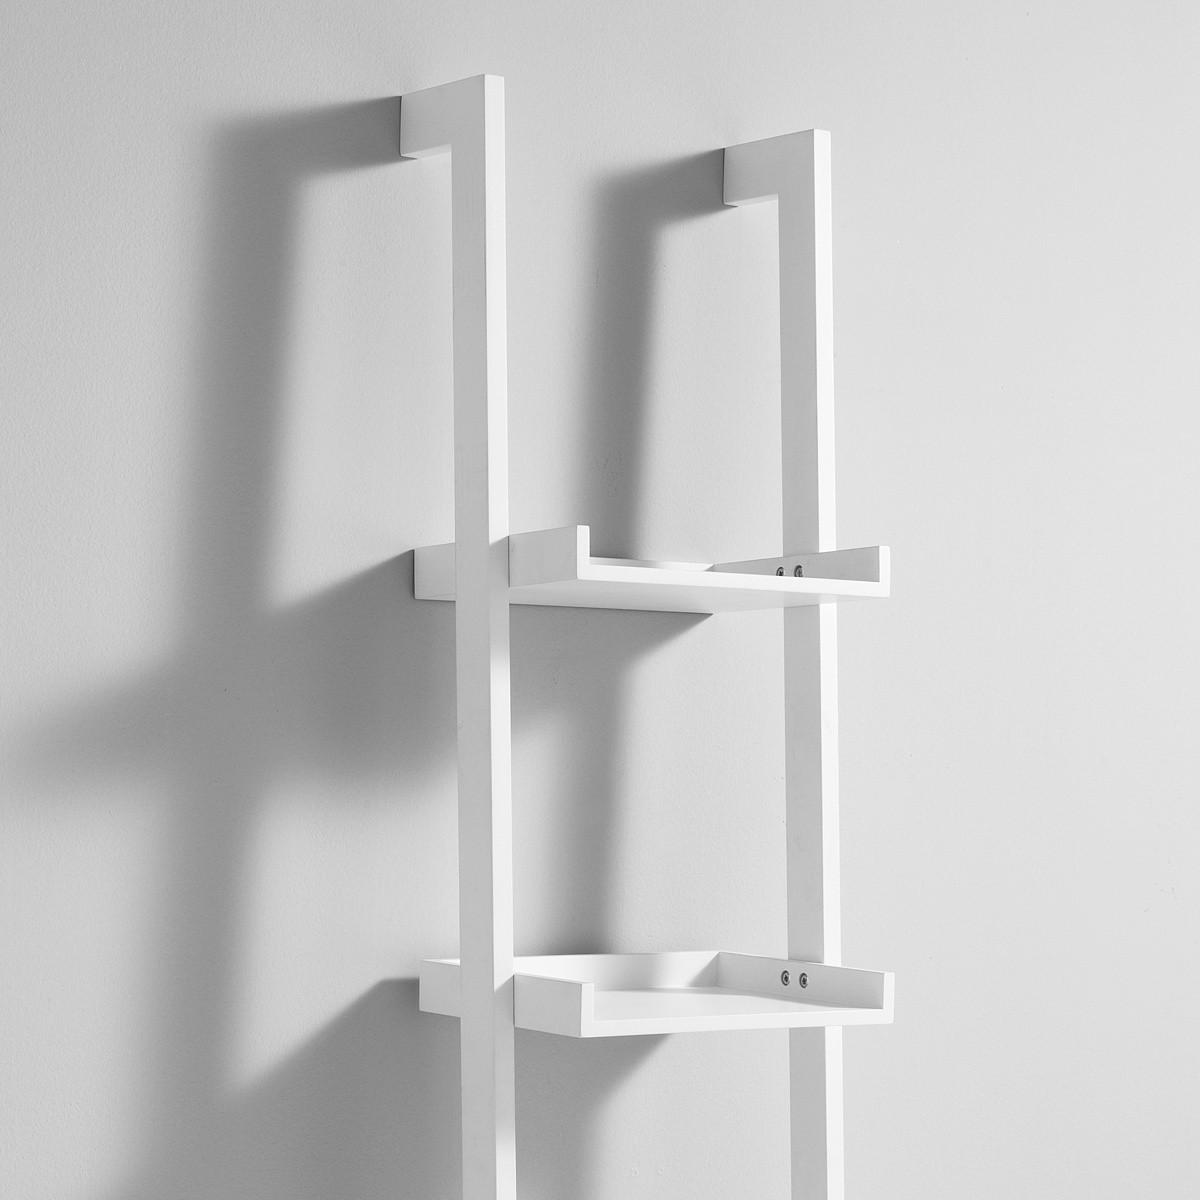 librerie da parete a colonna bergen in legno bianco 35 x 180 cm. Black Bedroom Furniture Sets. Home Design Ideas